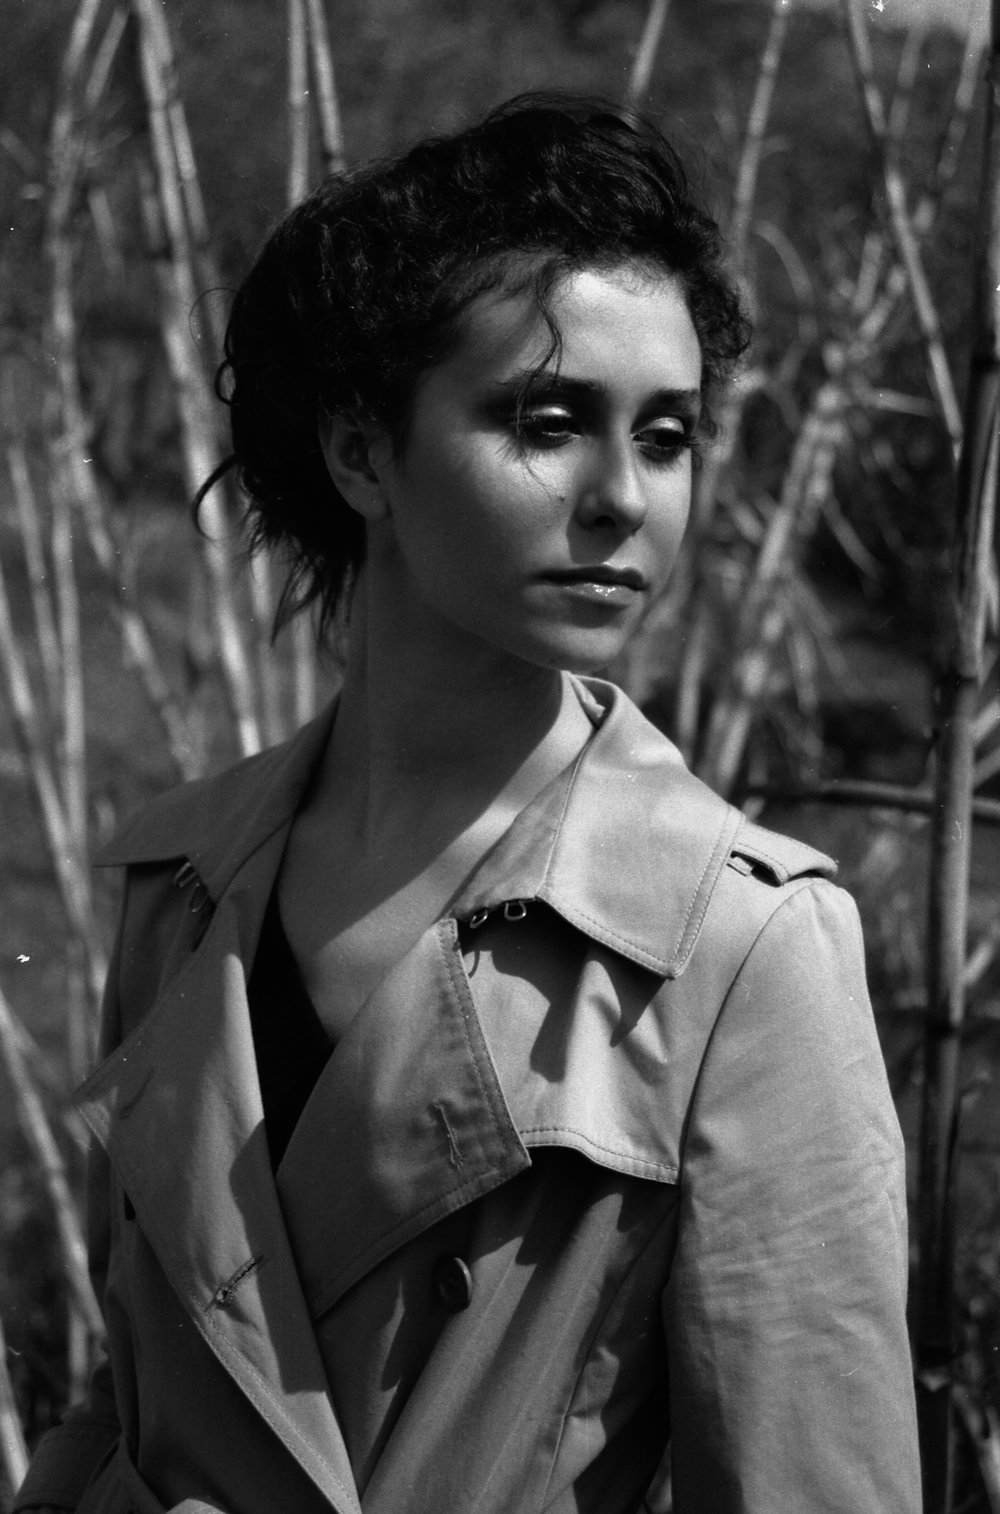 Annalaura Pretaroli - Martina